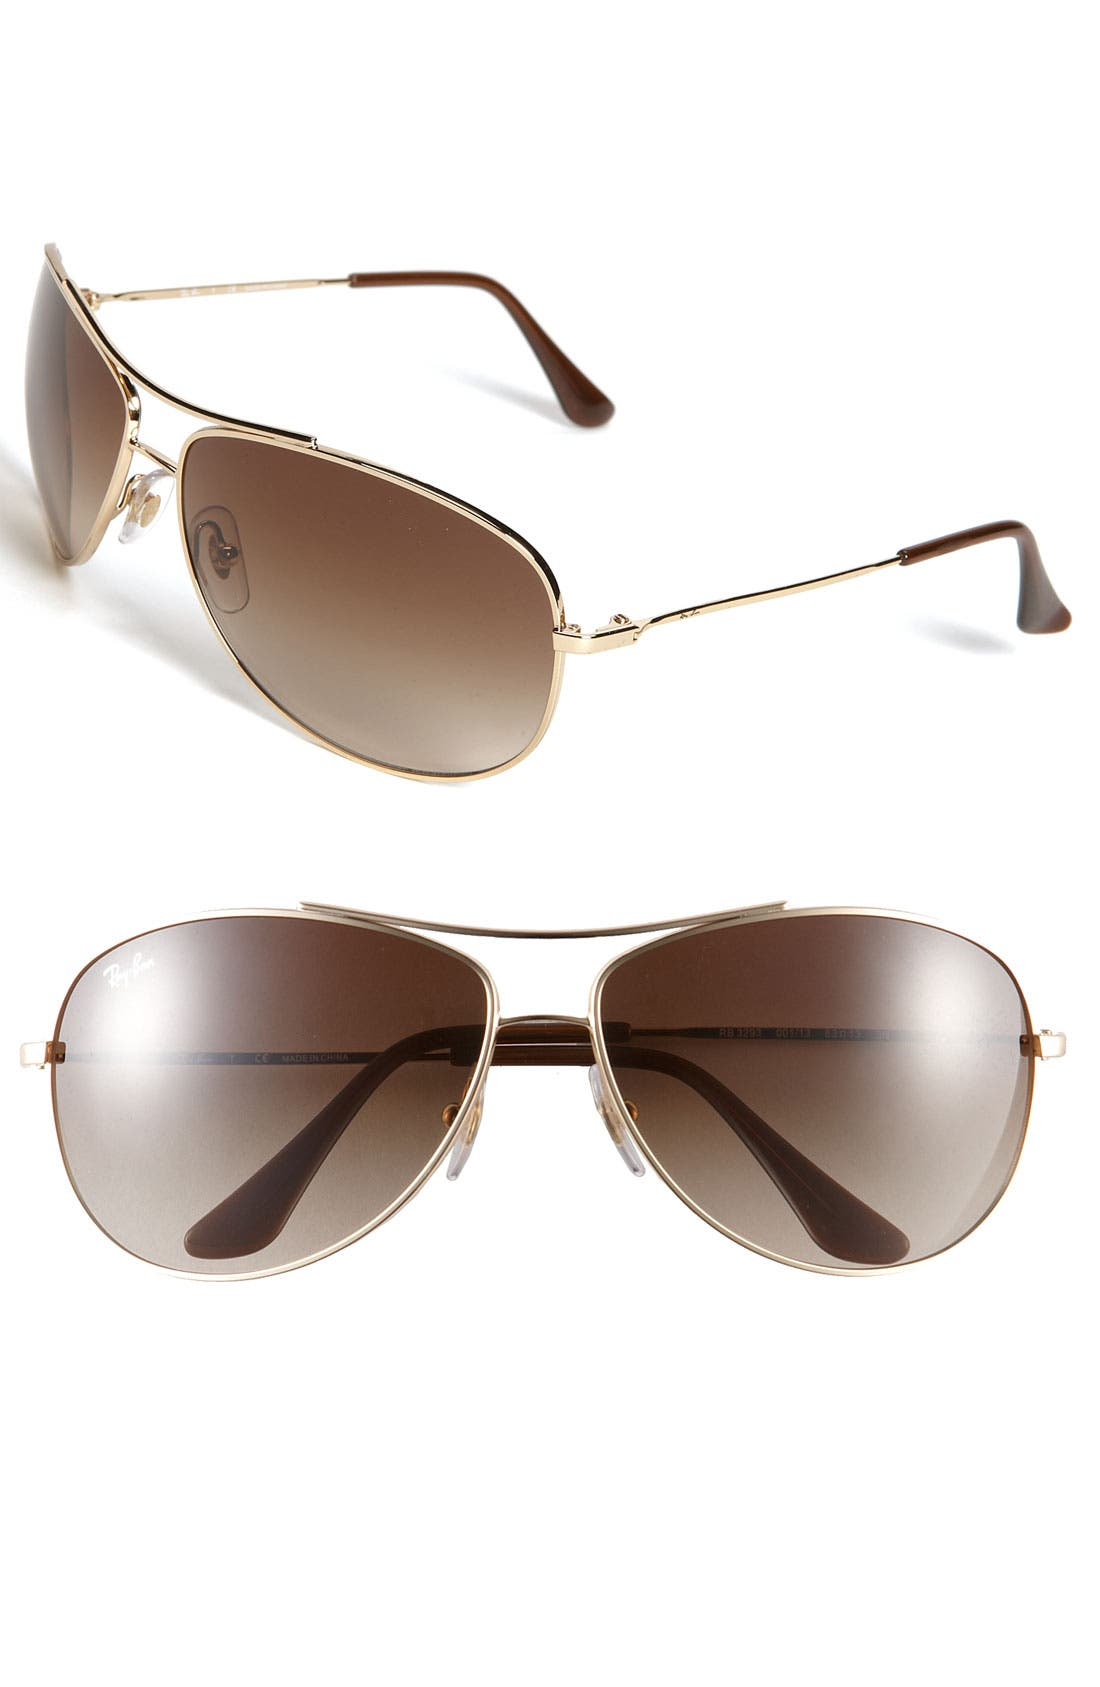 Main Image - Ray-Ban 'Wayfarer' 51mm Sunglasses